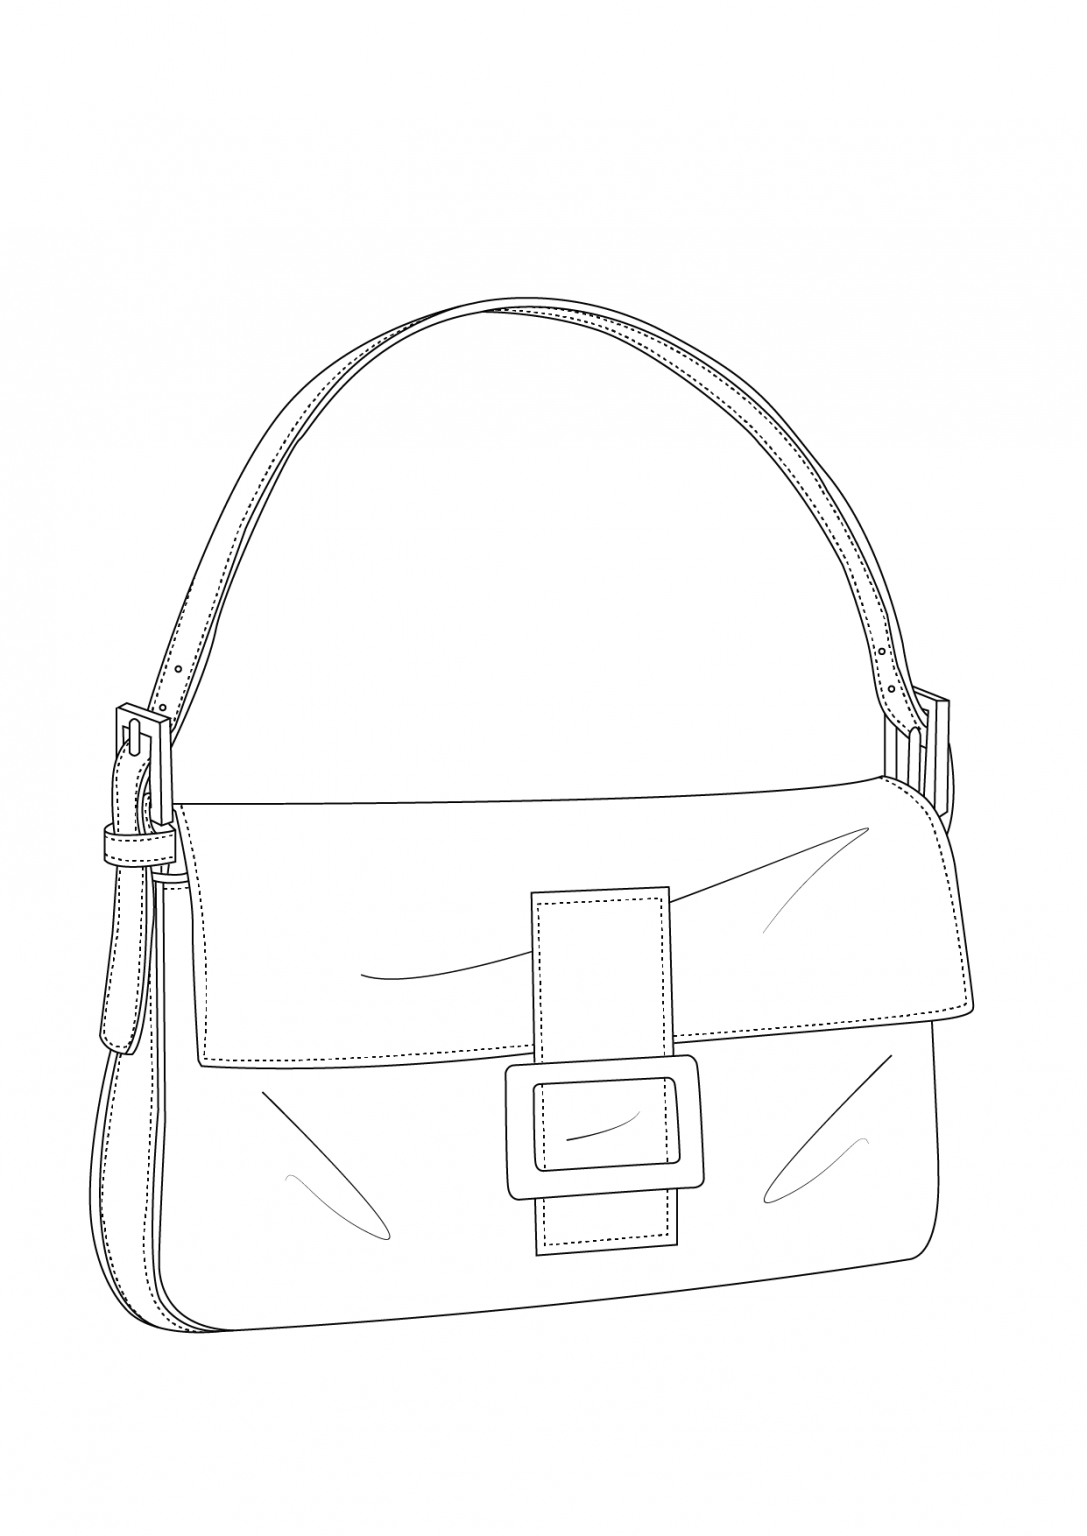 baguette_Tavola disegno 1 copia